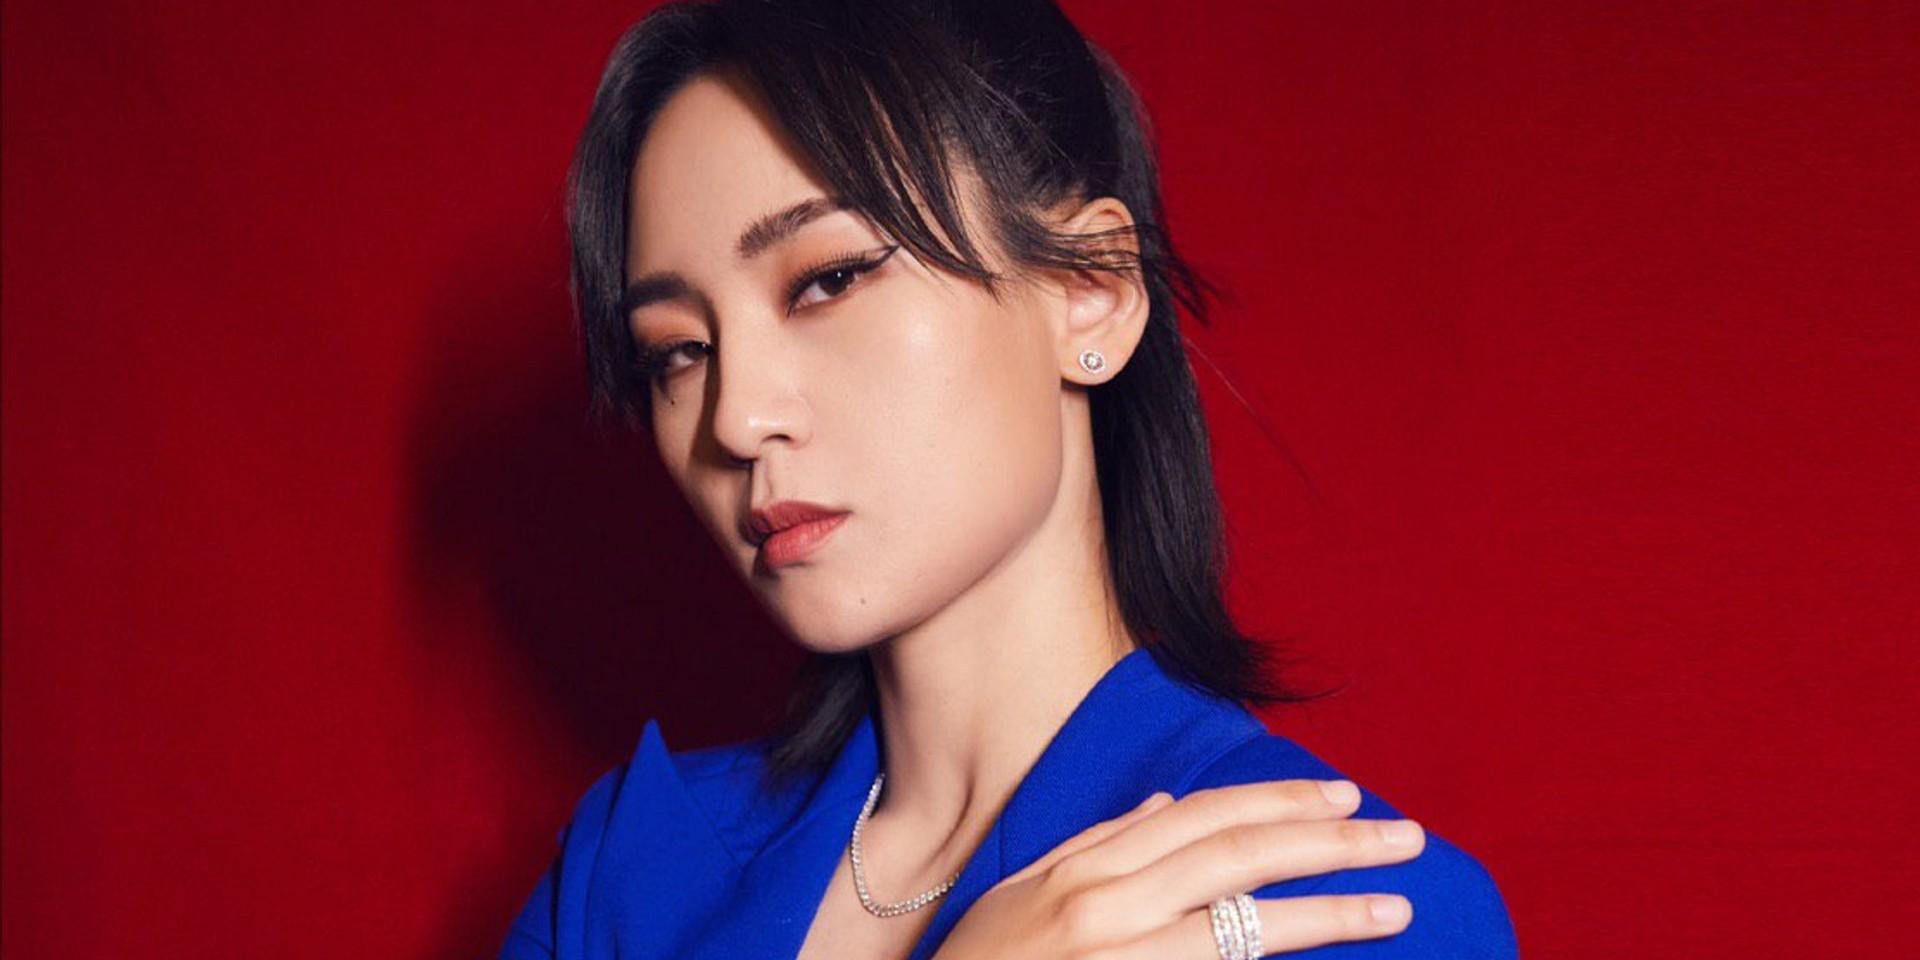 Mandopop artist Bibi Zhou releases new album, Slime